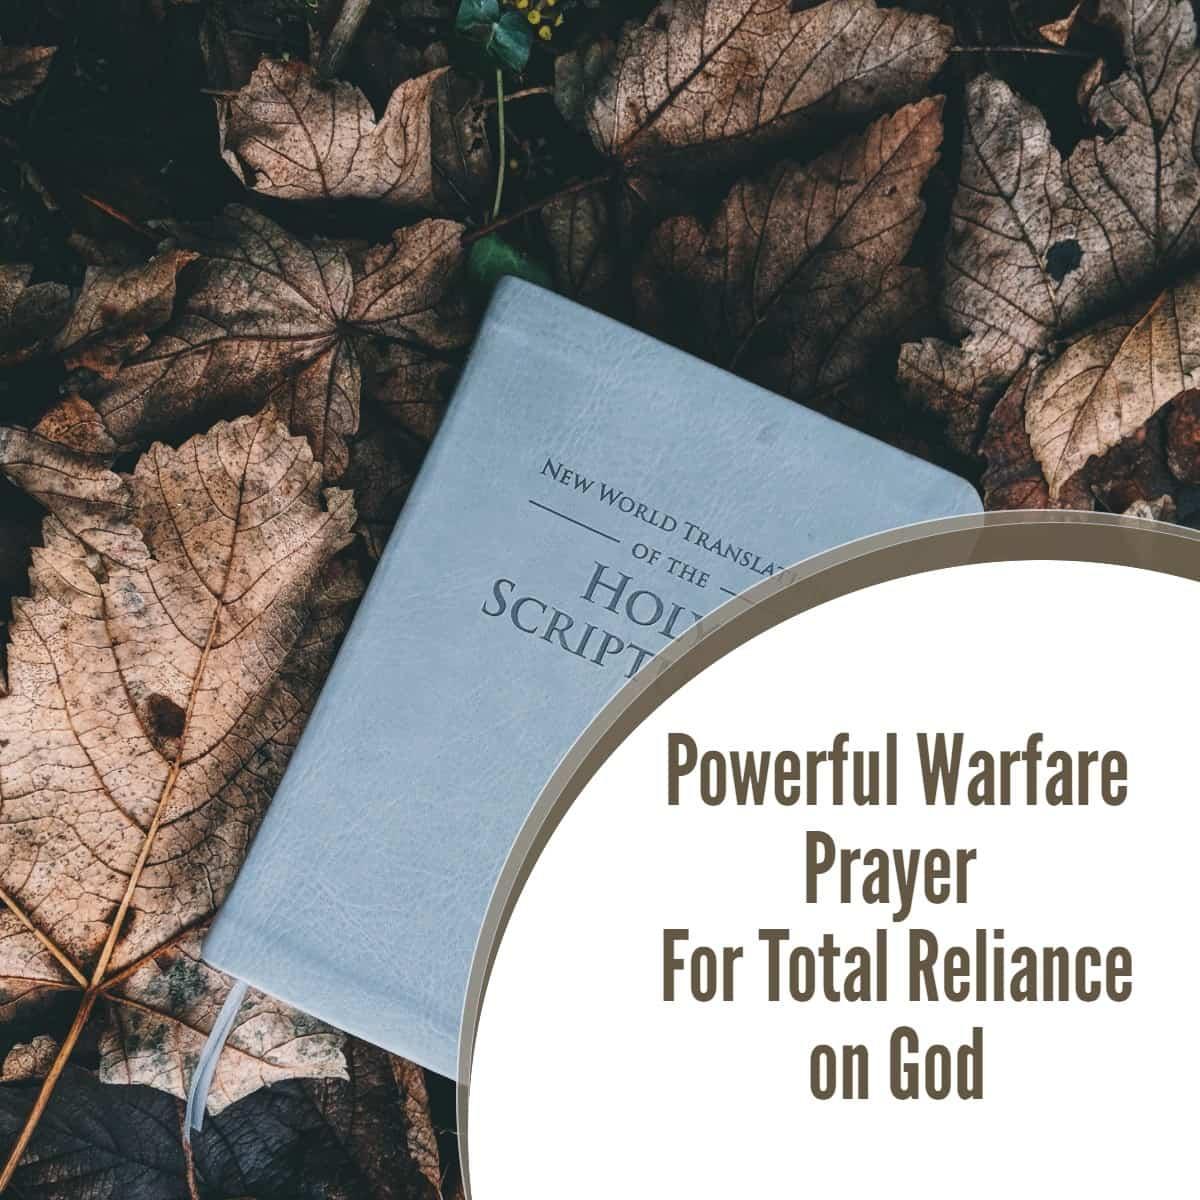 Powerful Warfare Prayer For Total Reliance on God